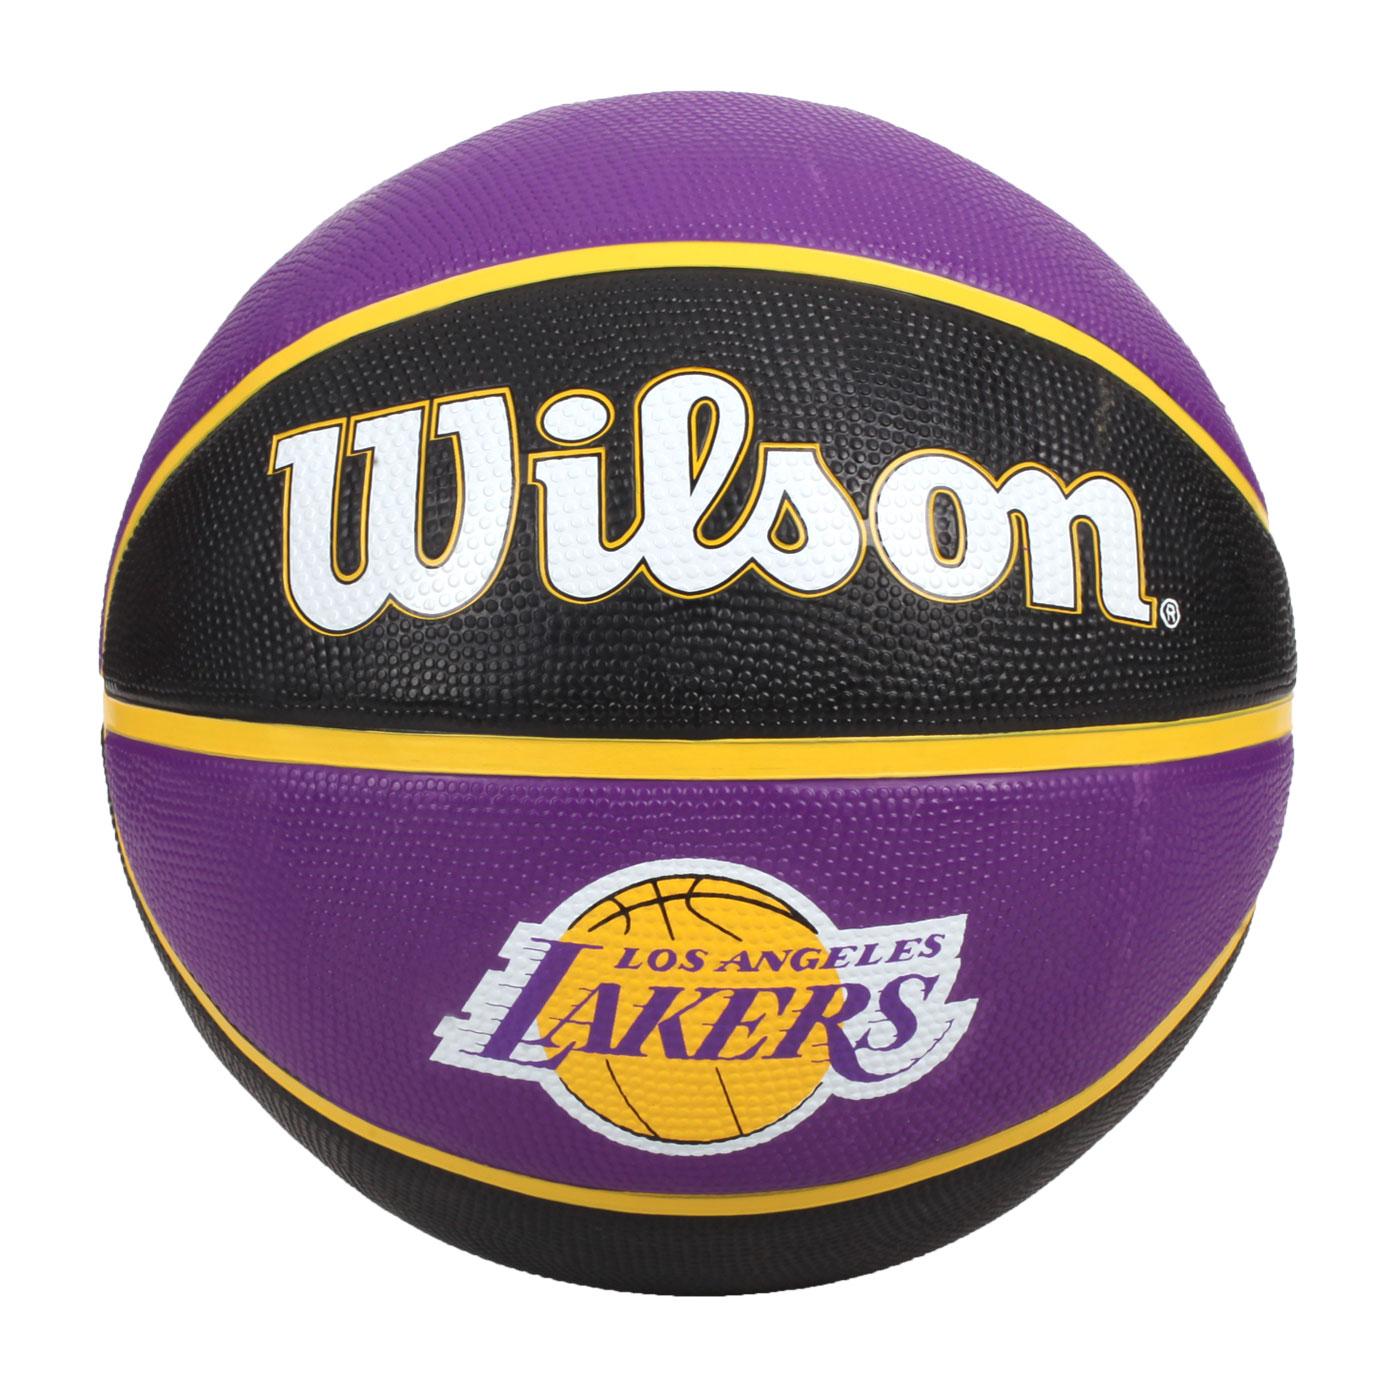 WILSON NBA隊徽系列21' 湖人隊橡膠籃球#7 WTB1300XBLAL